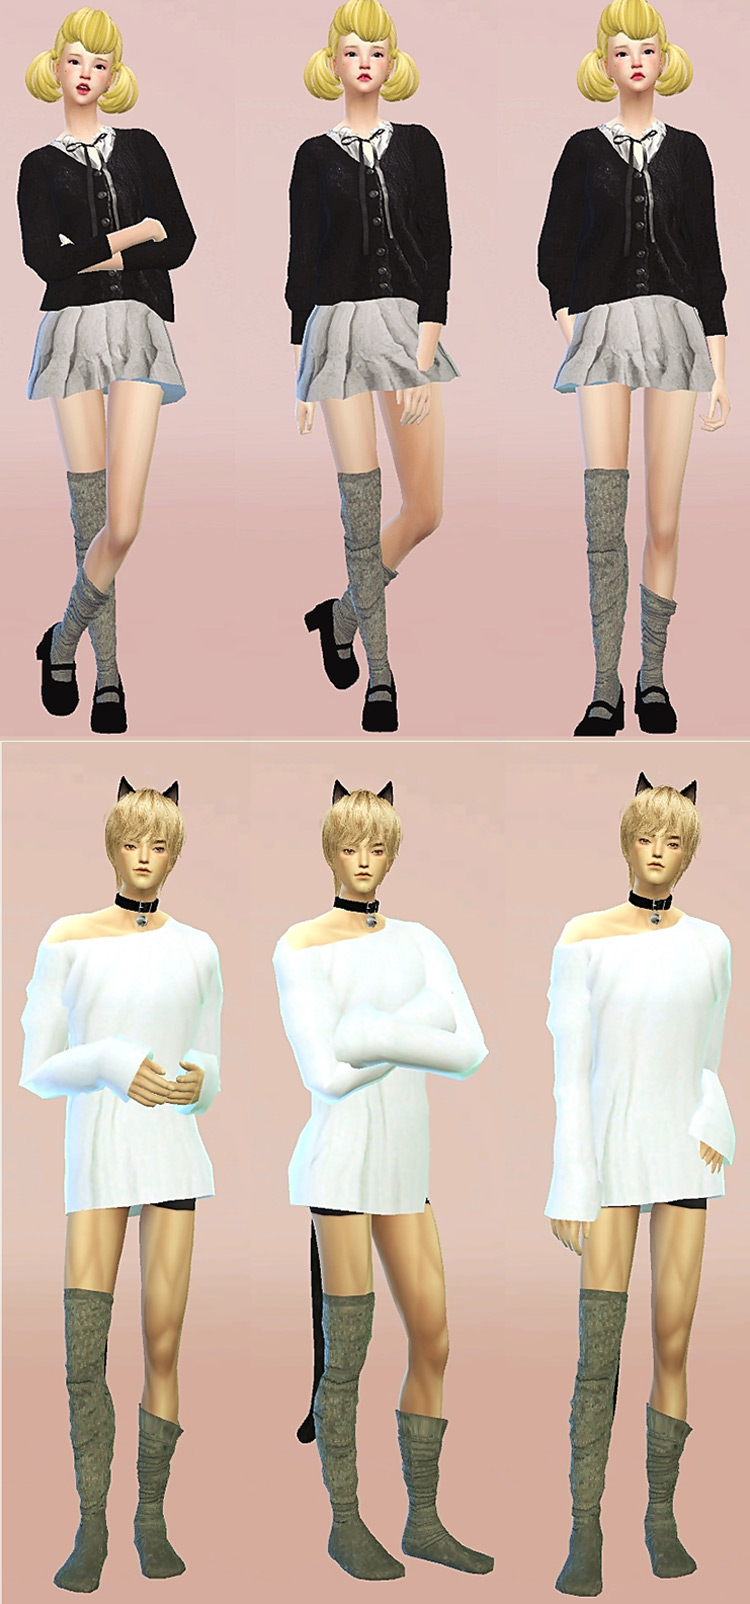 Female Loose Socks + Male Loose Socks by Sims4 Marigold TS4 CC